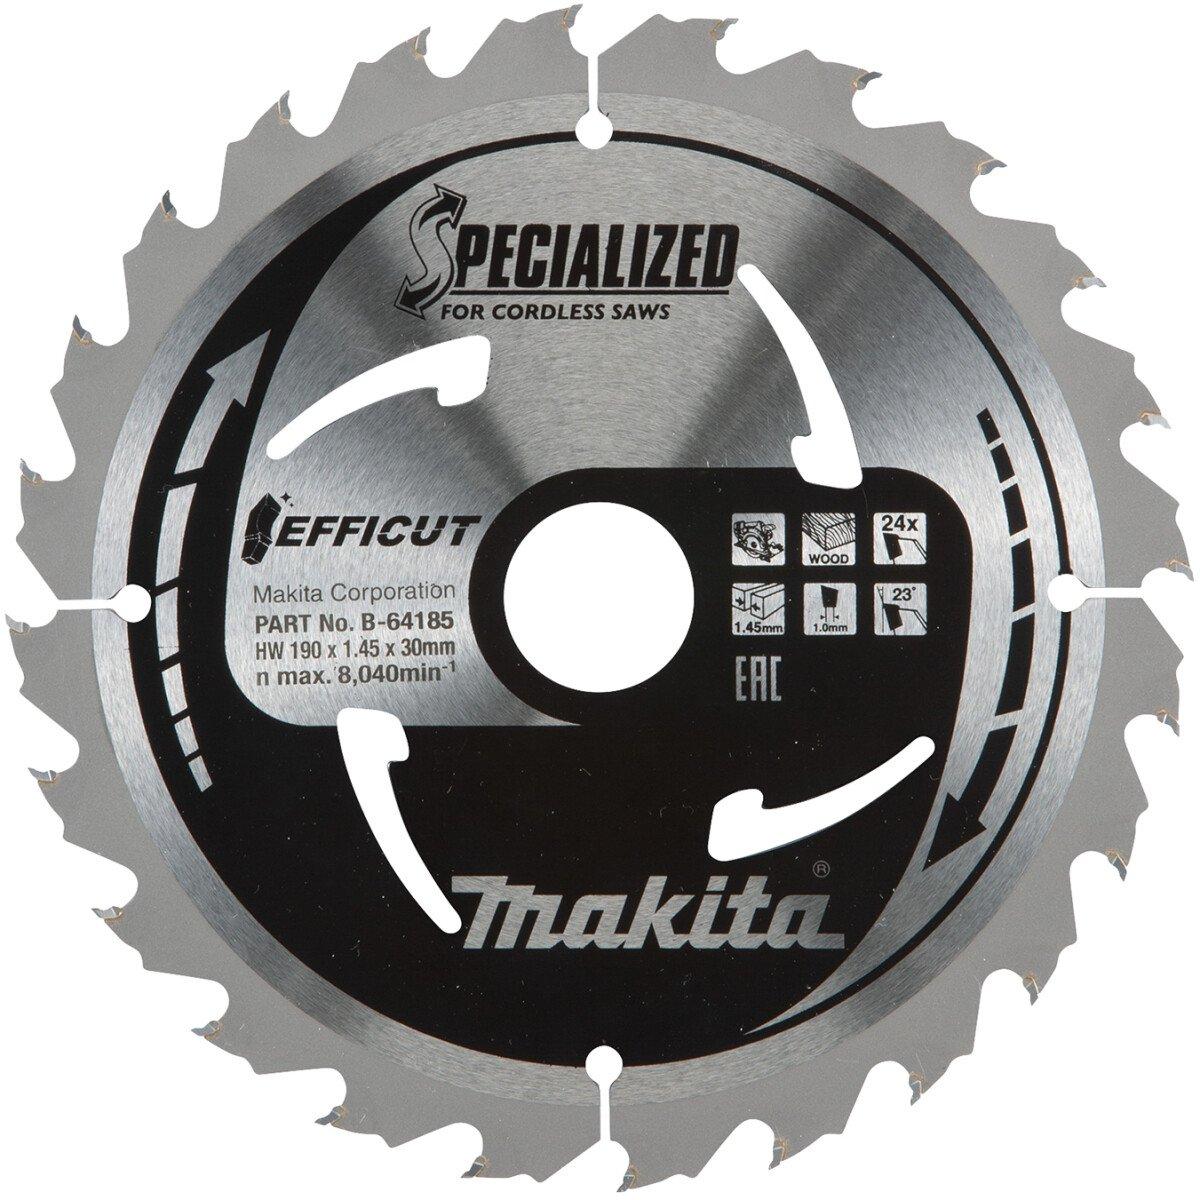 Makita Efficut Saw Blade 190mm x 30mm x 24th x 1.45mm Thick - B-64185